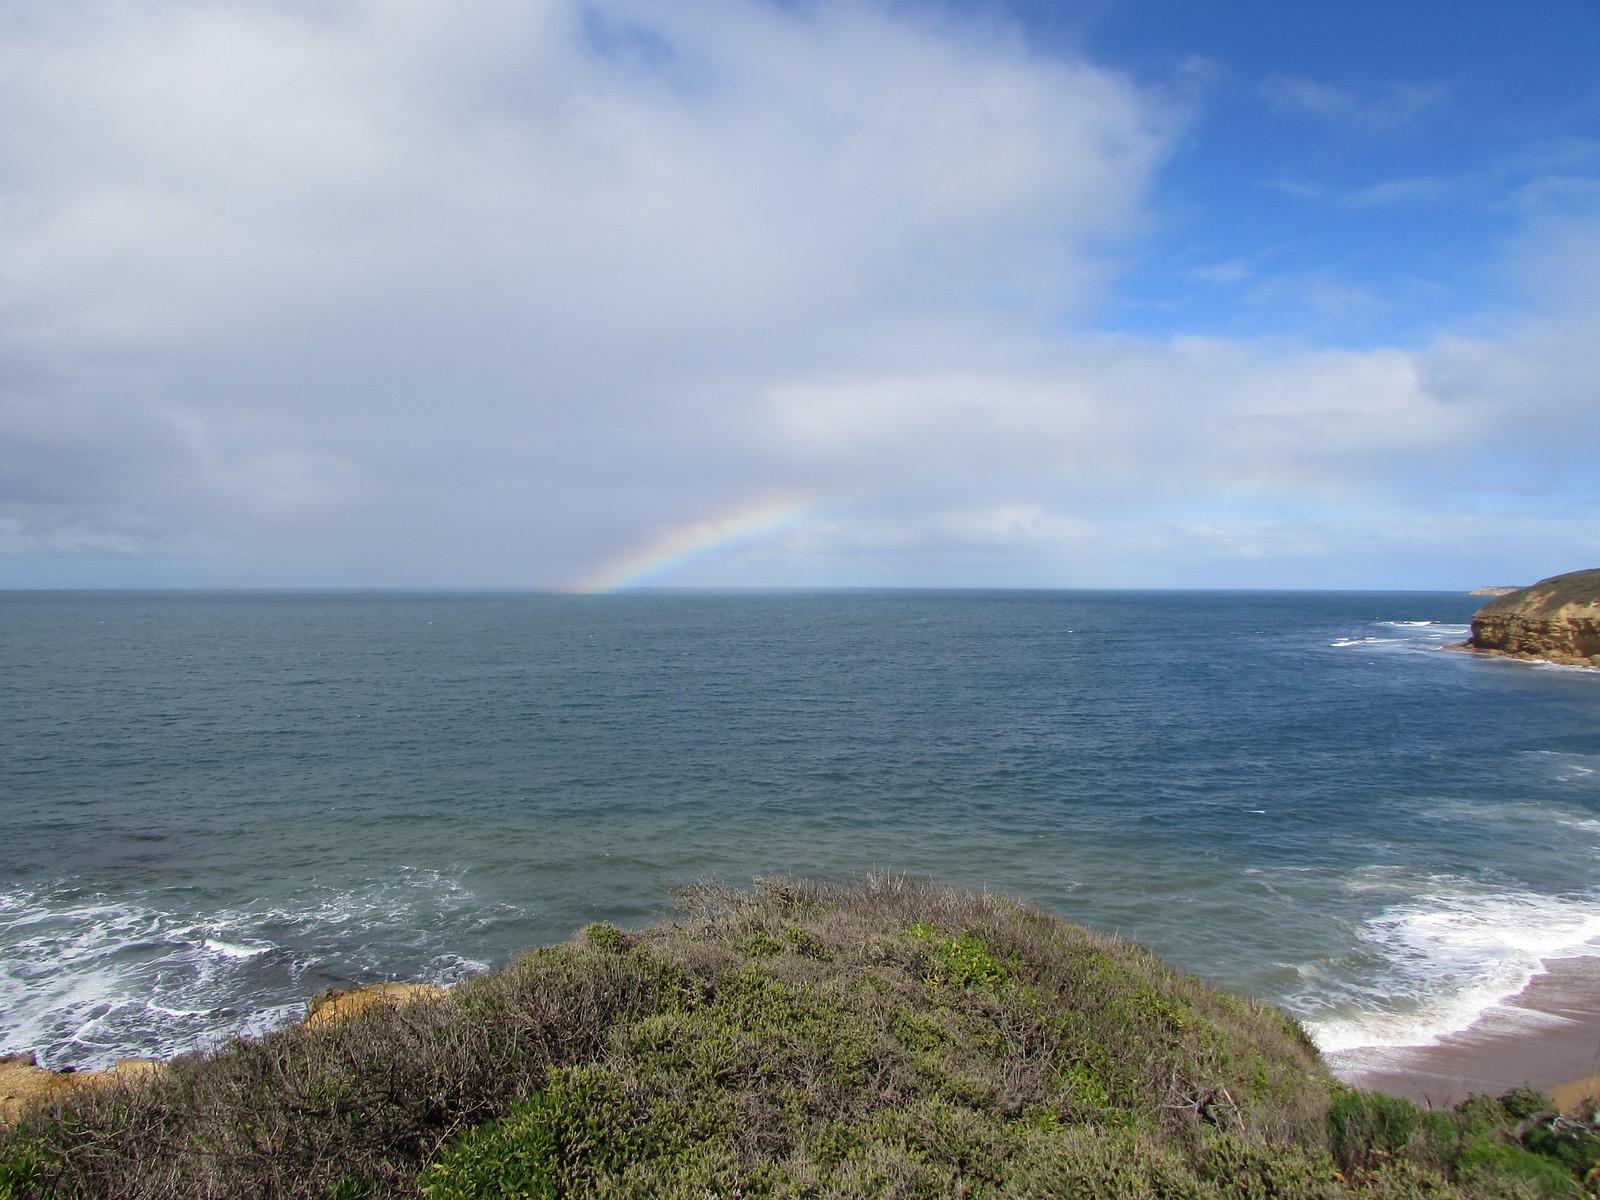 A rainbow - at Bells Beach